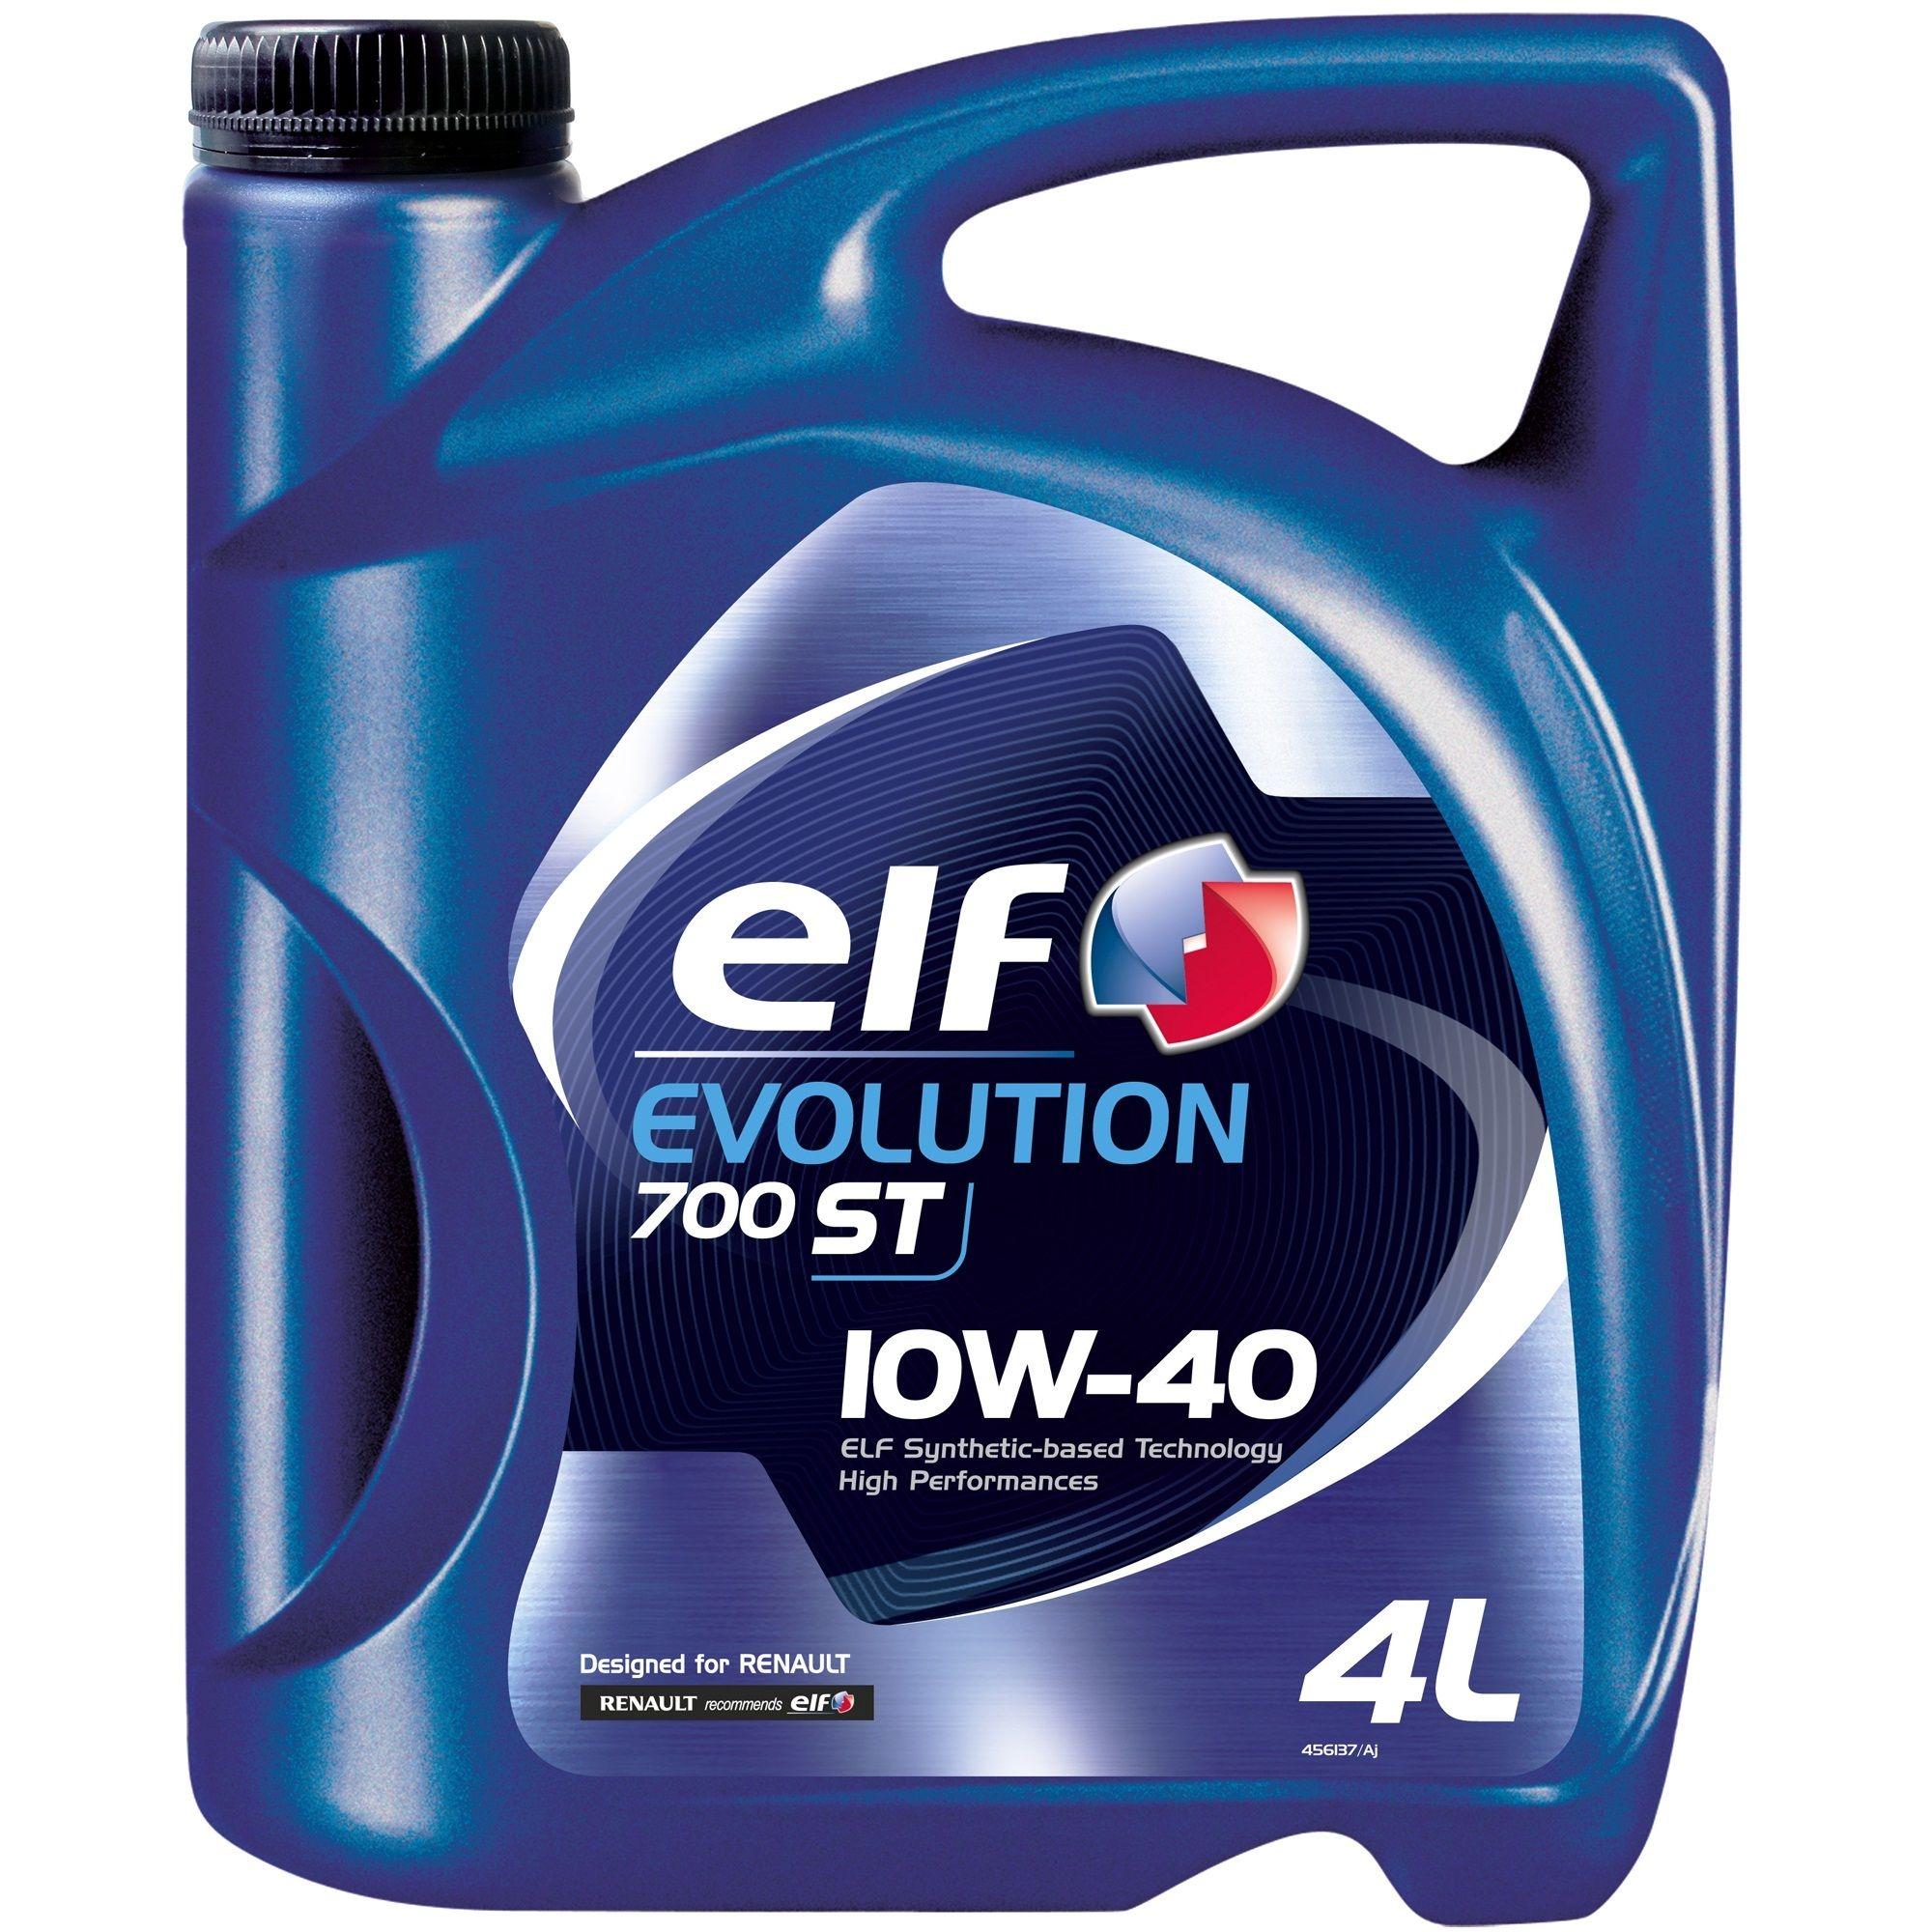 Ulei motor Elf Evolution 700 ST 10W40 4L